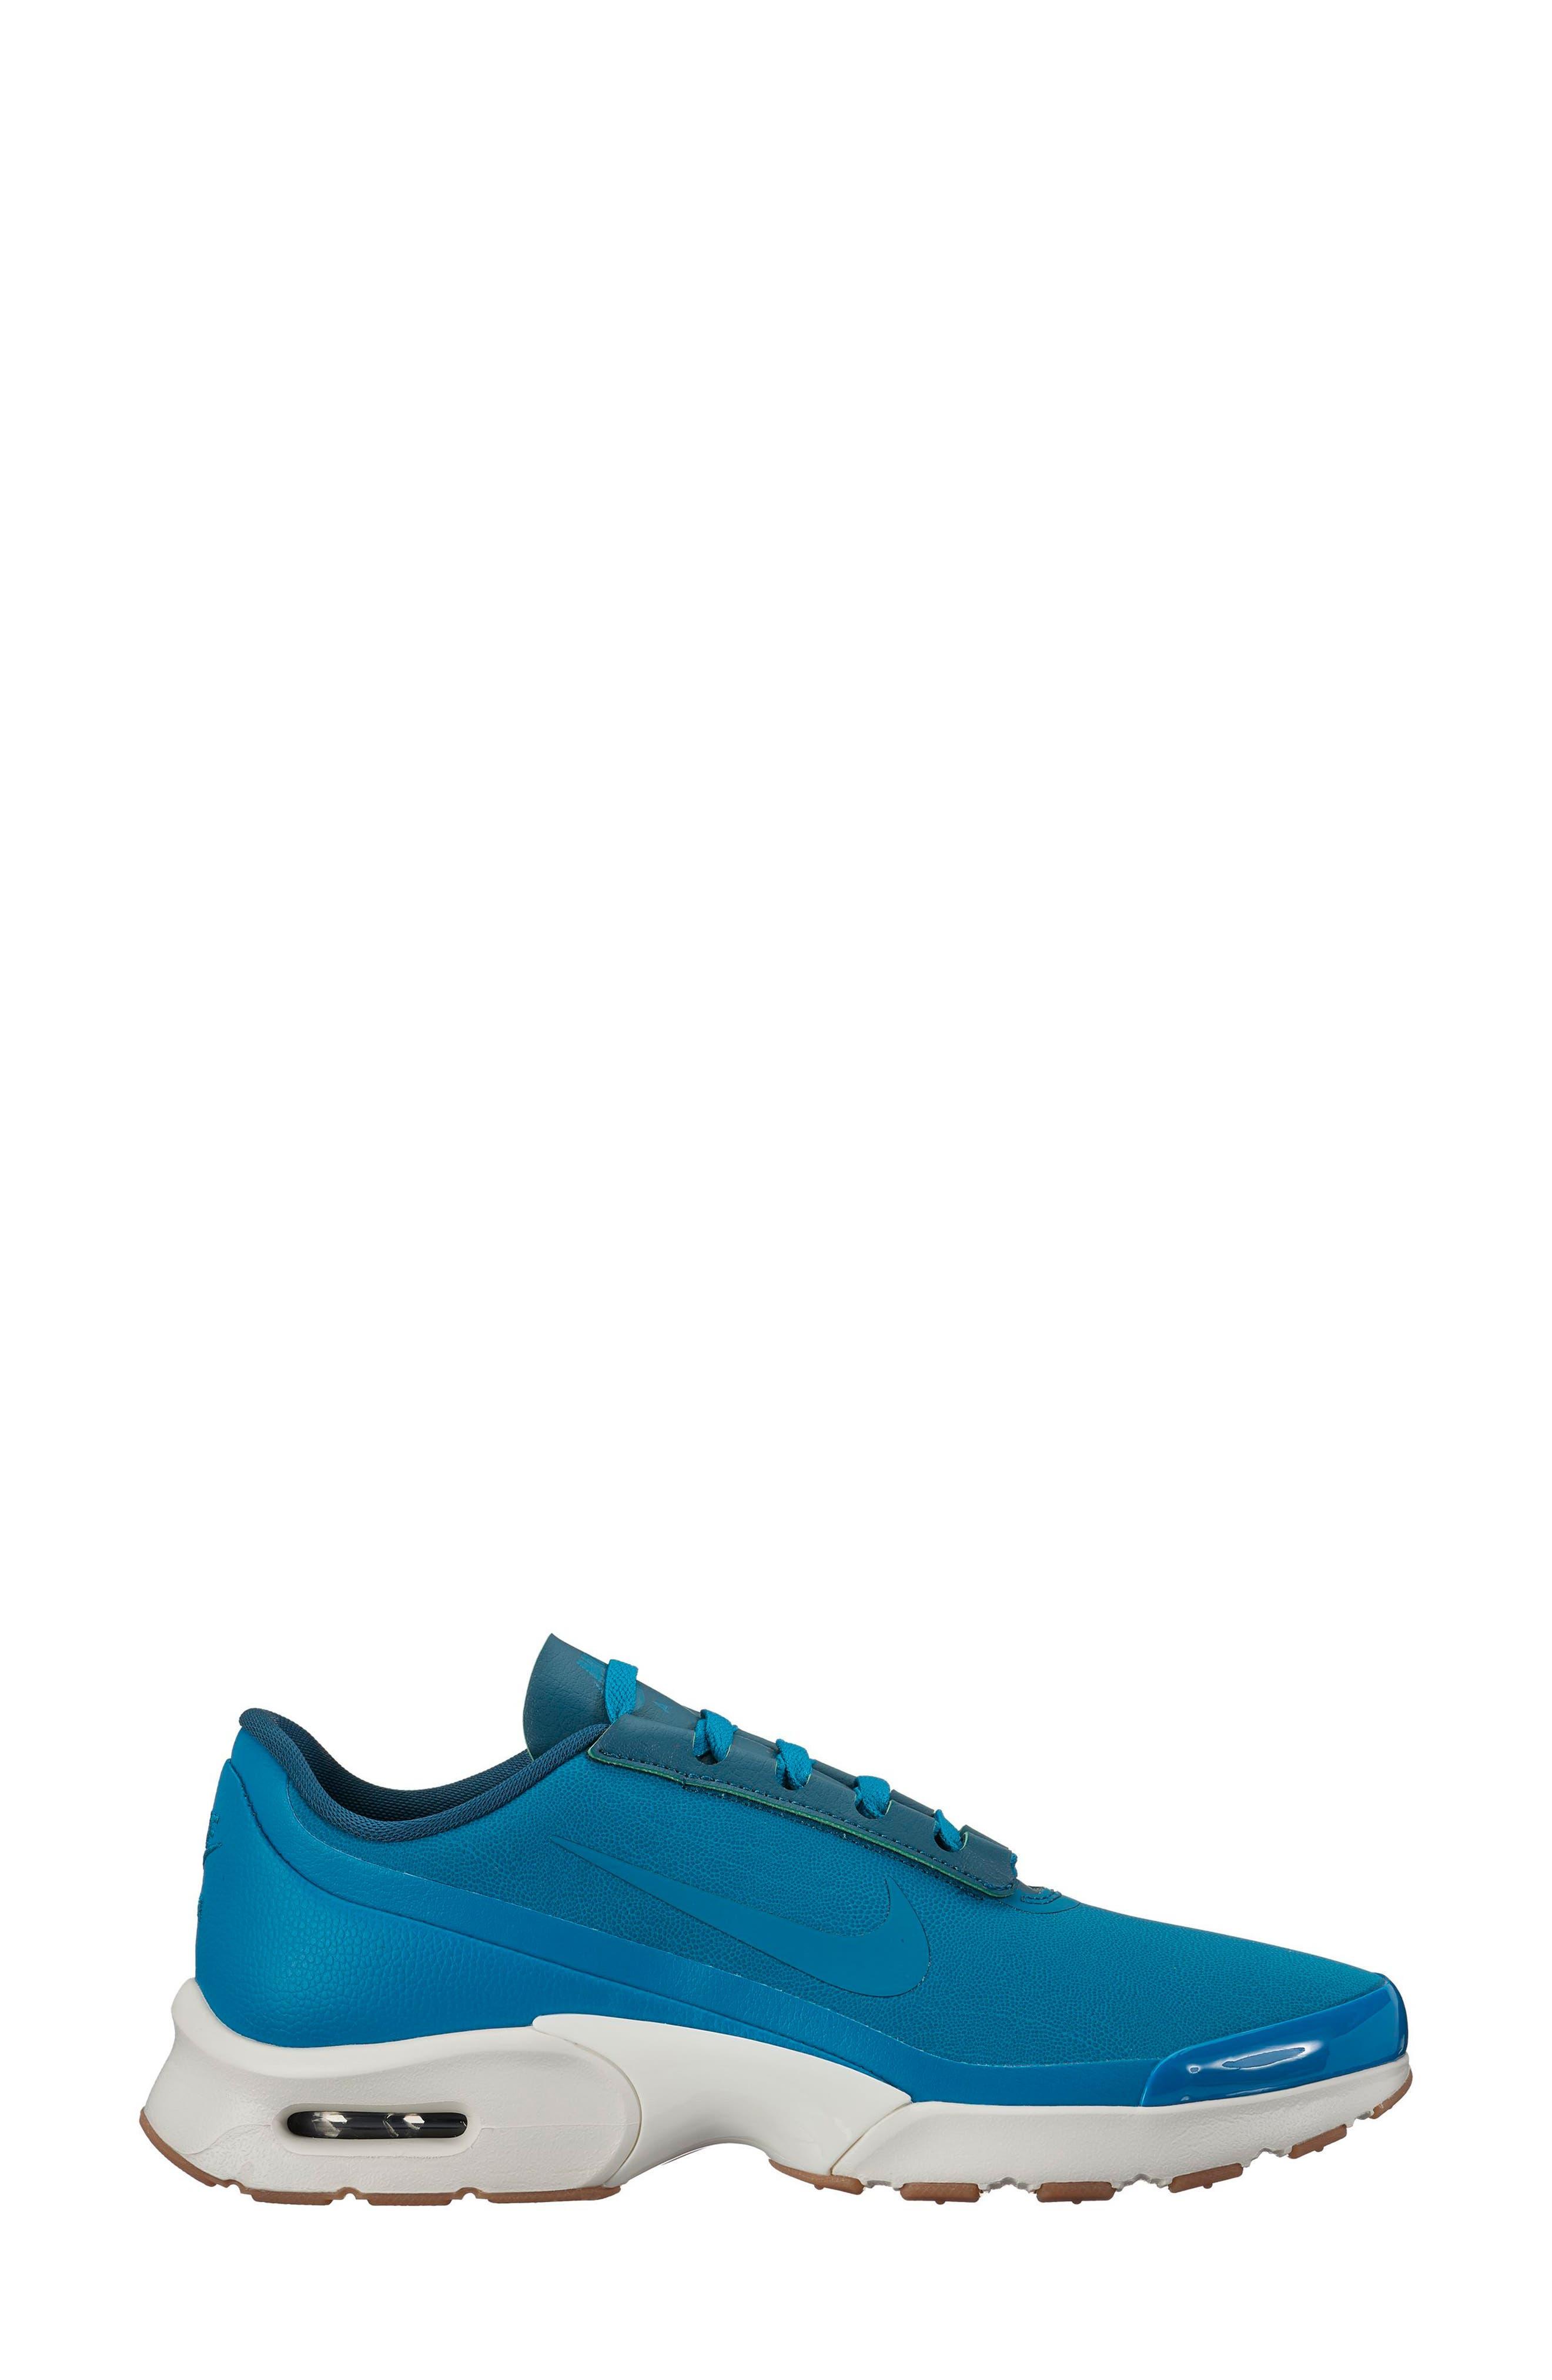 Air Max Jewell SE Sneaker,                             Main thumbnail 1, color,                             440